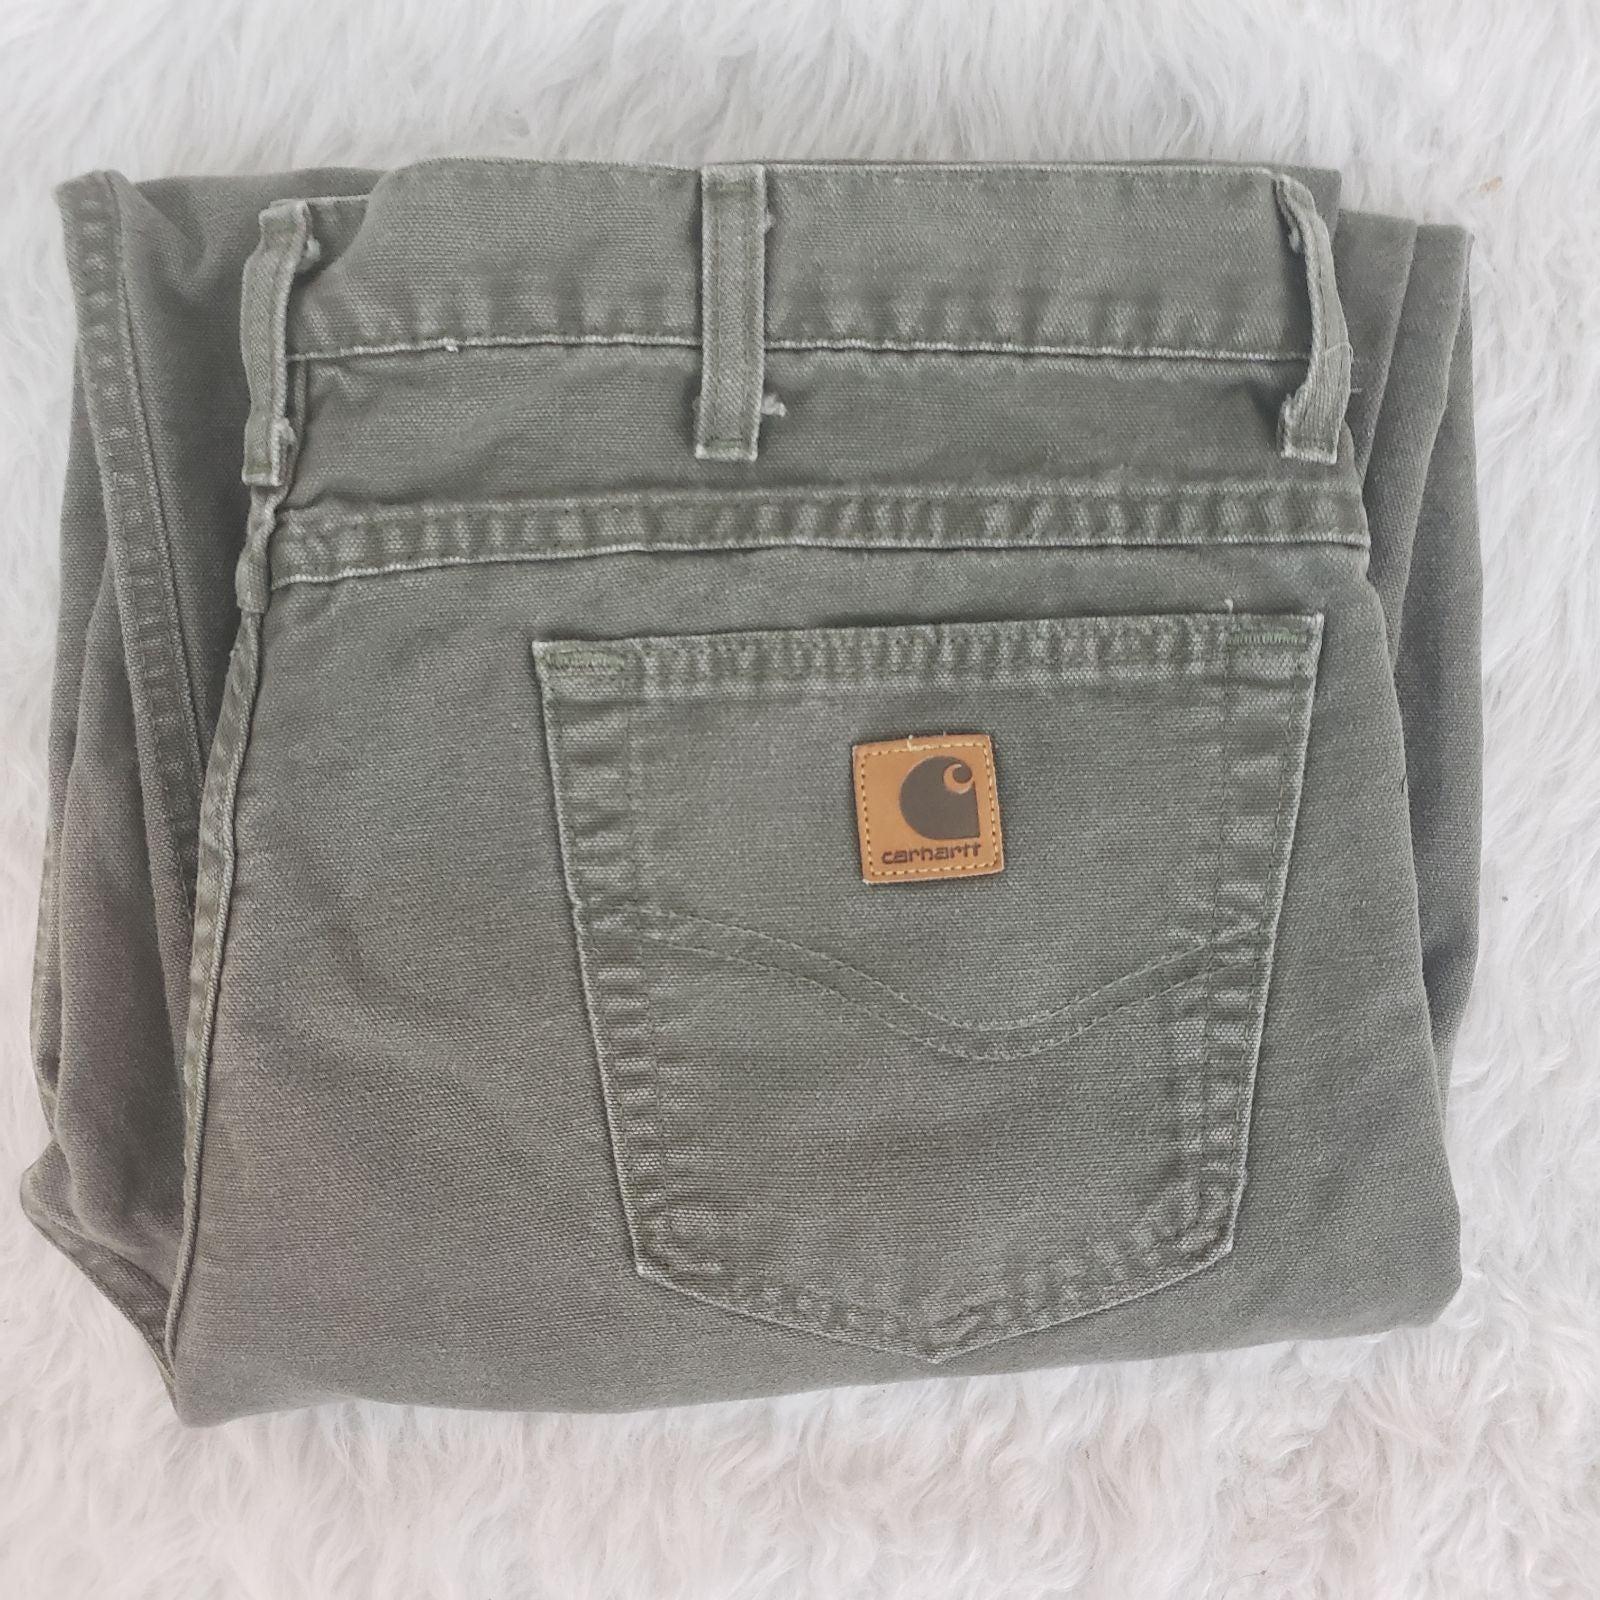 Carhartt 40x34 Gray Green Mens Jeans